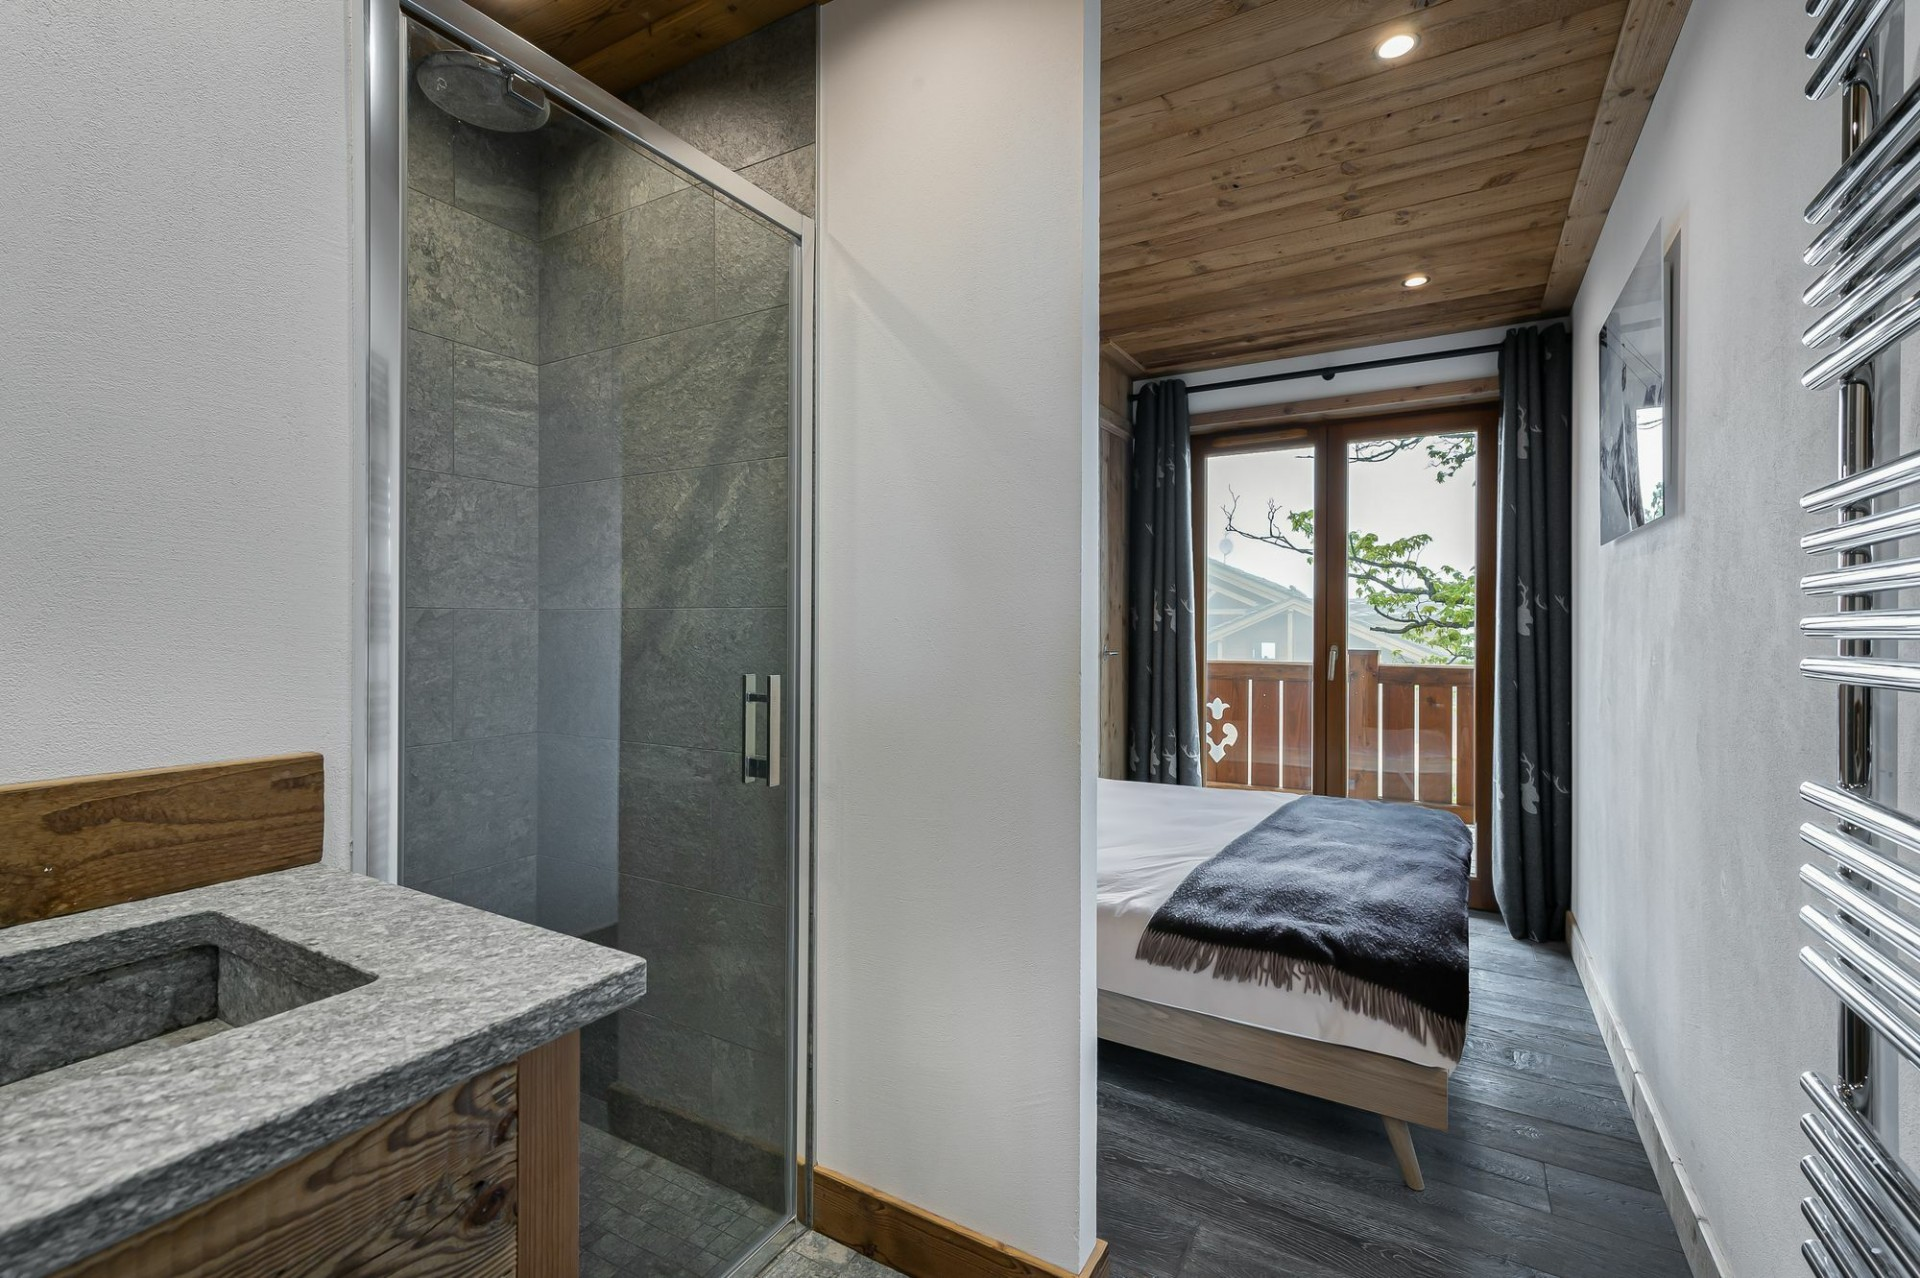 Courchevel 1300 Location Appartement Luxe Tilante Chambre 2